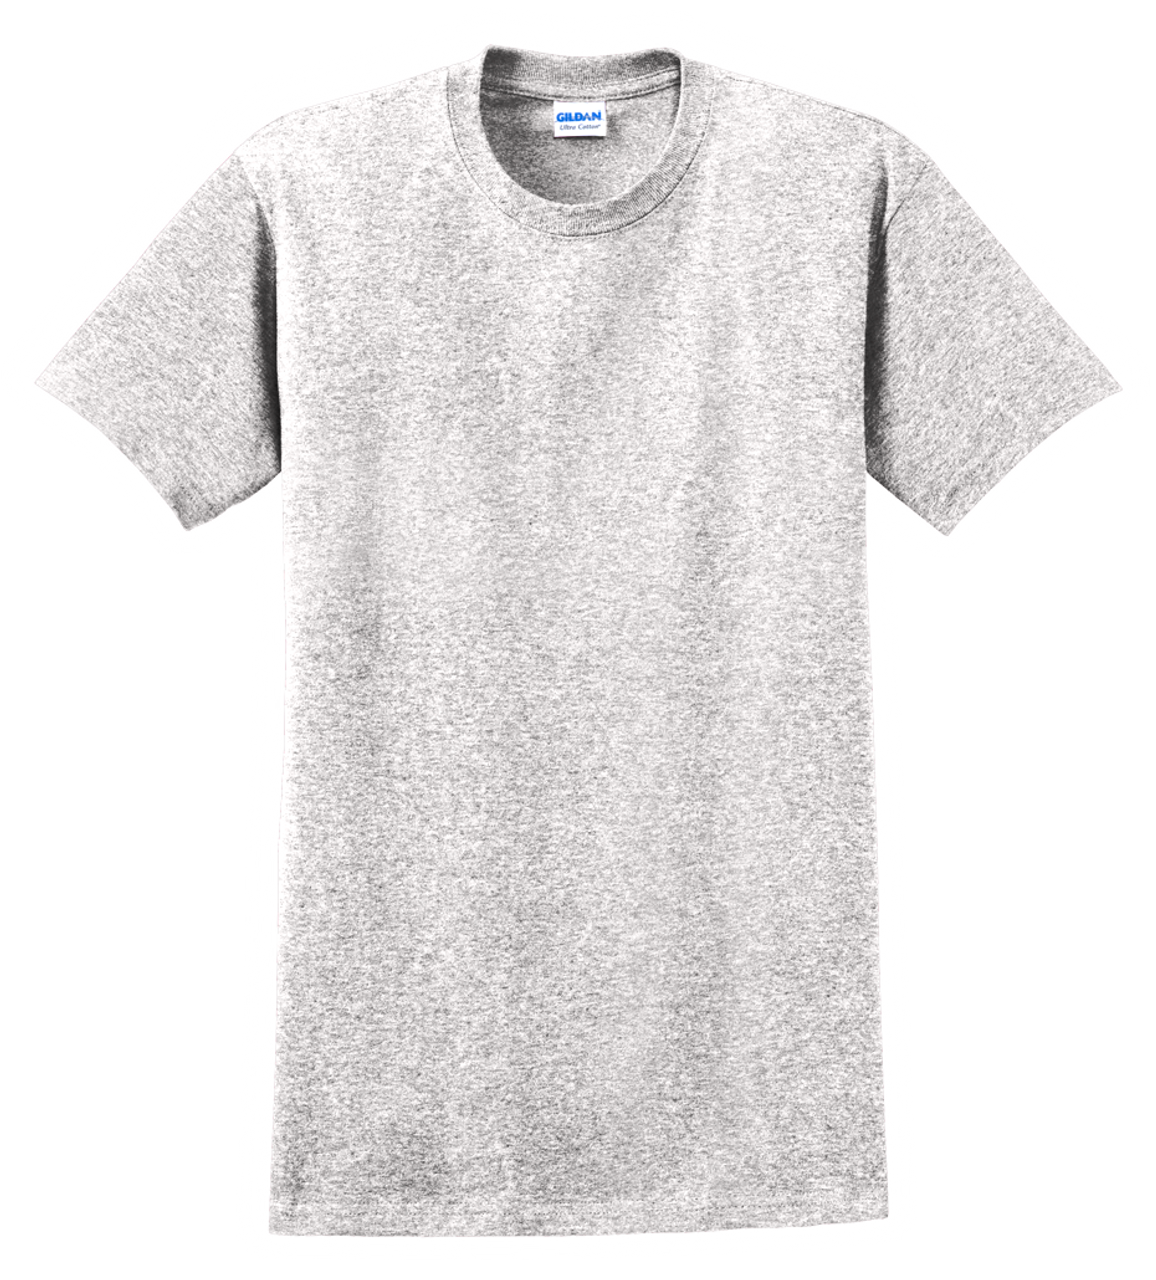 G2000 Ash T-Shirt Short Sleeve by Gildan